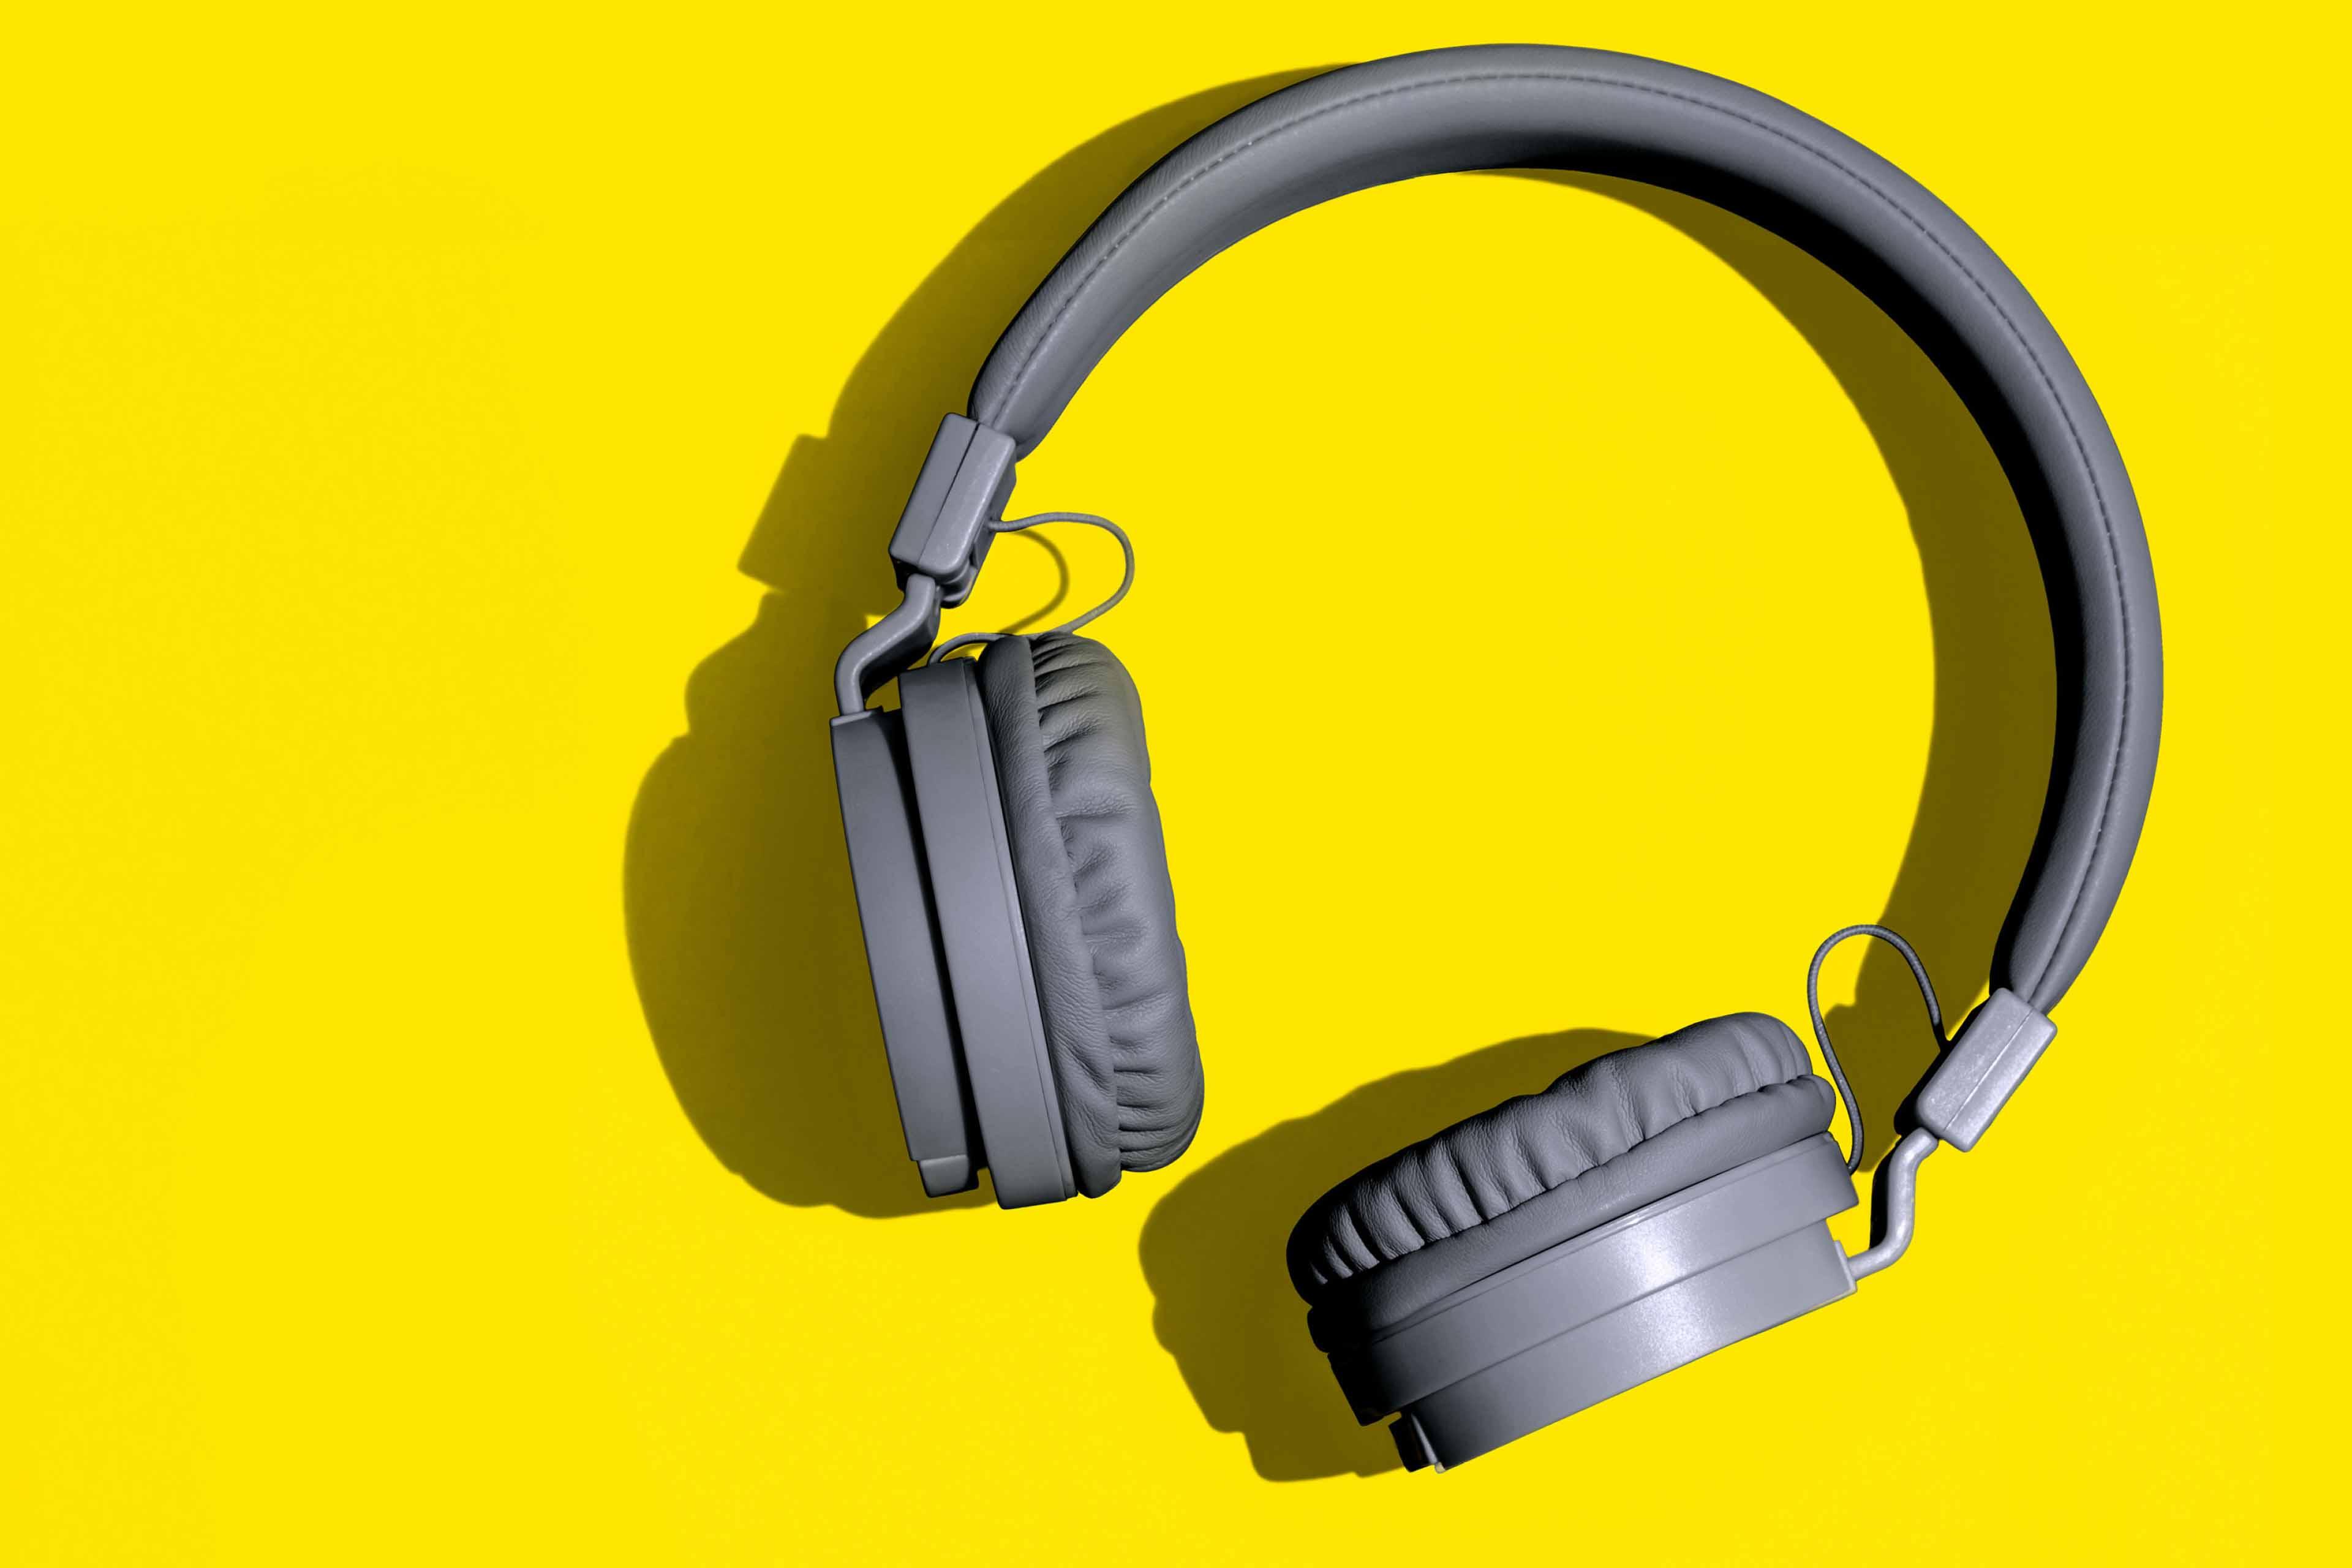 ey-headphone-transformation-tacheles-podcast-version1-20210223